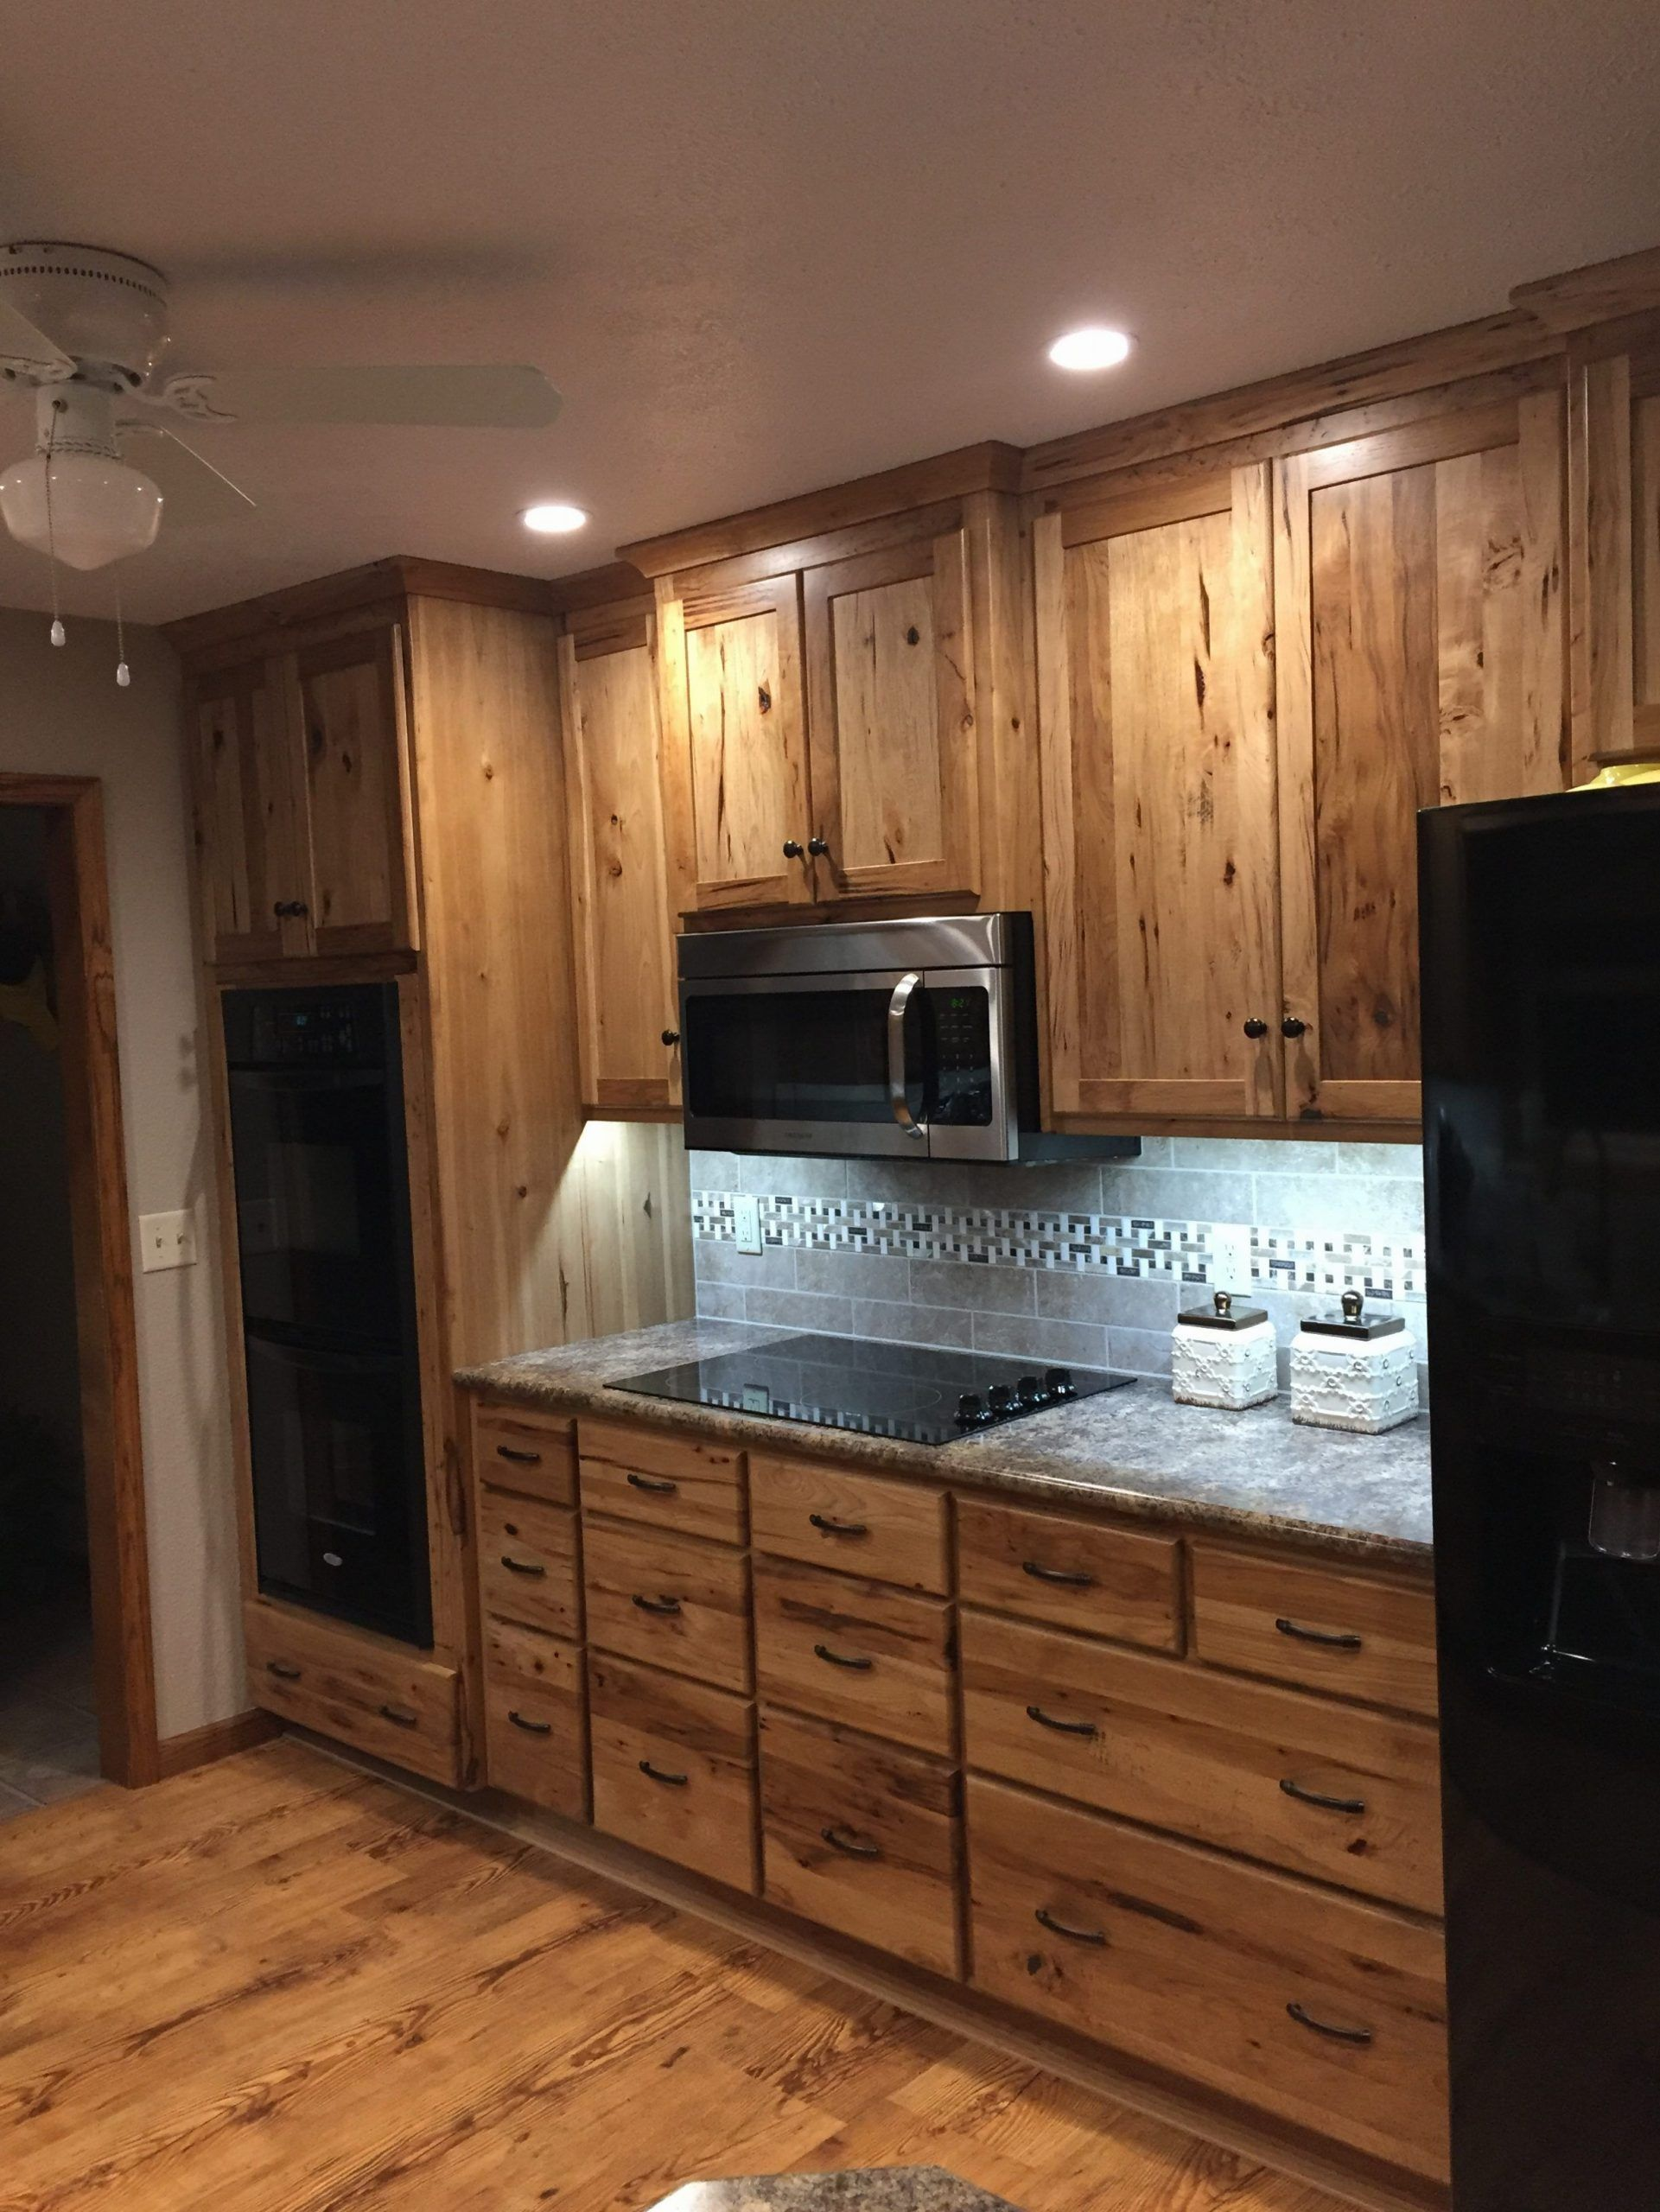 Rustikale Hickory Kuchenschranke Wheatstate Wood Design Lf Wie Die Graue Theke Design Die Grau In 2020 Hickory Kitchen Cabinets Hickory Kitchen Kitchen Cabinets